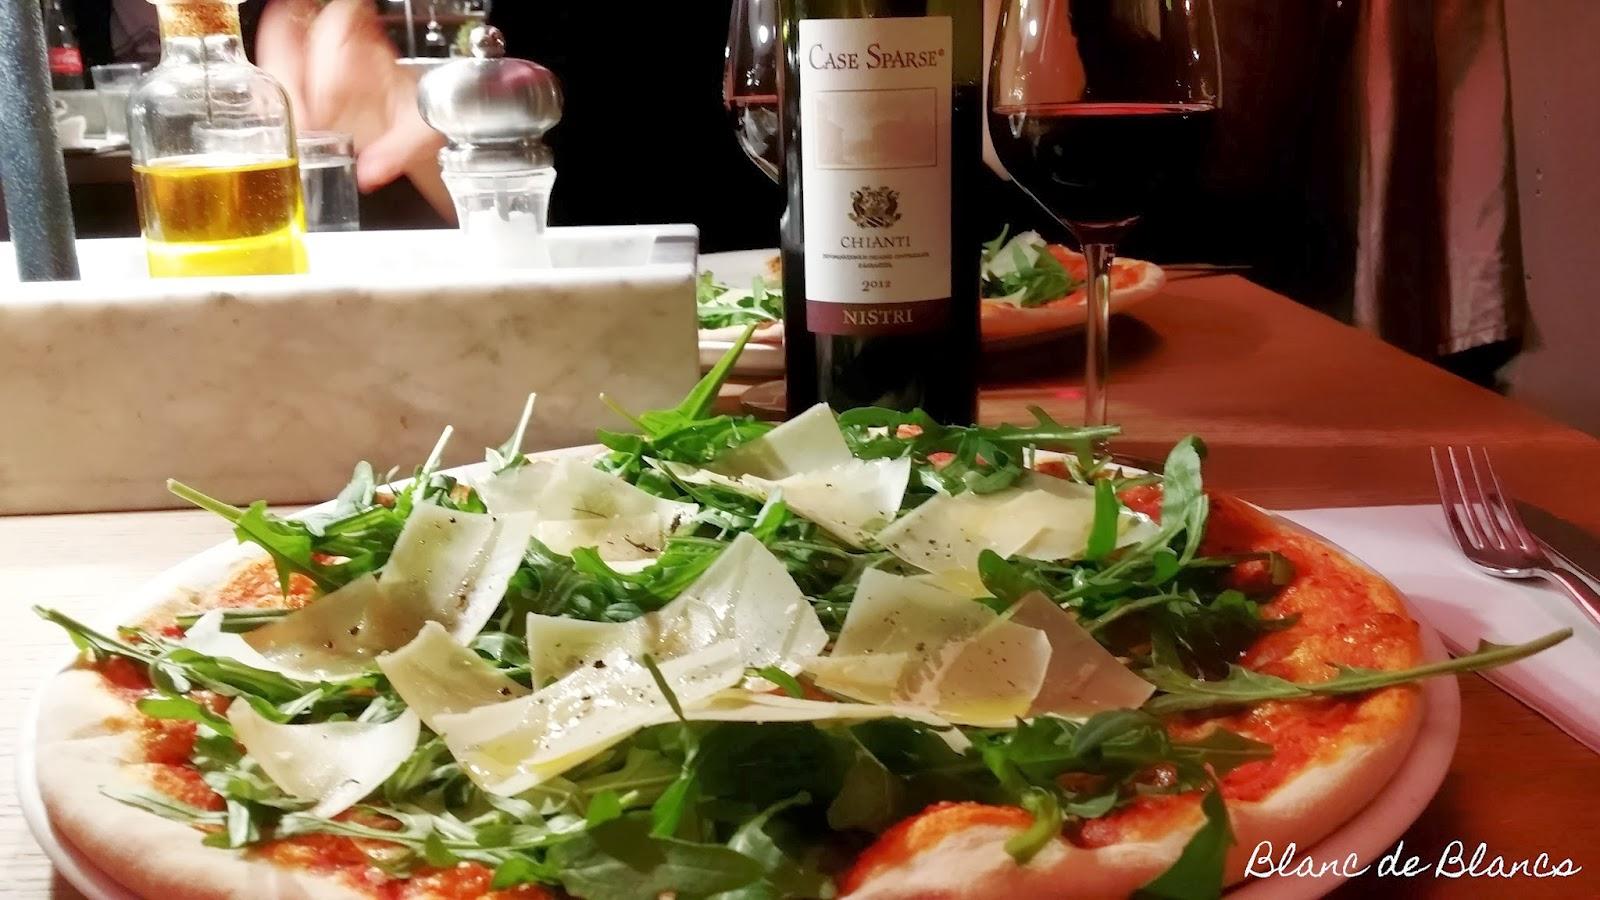 Vapiano pizza rucola ja Chianti - www.blancdeblancs.fi